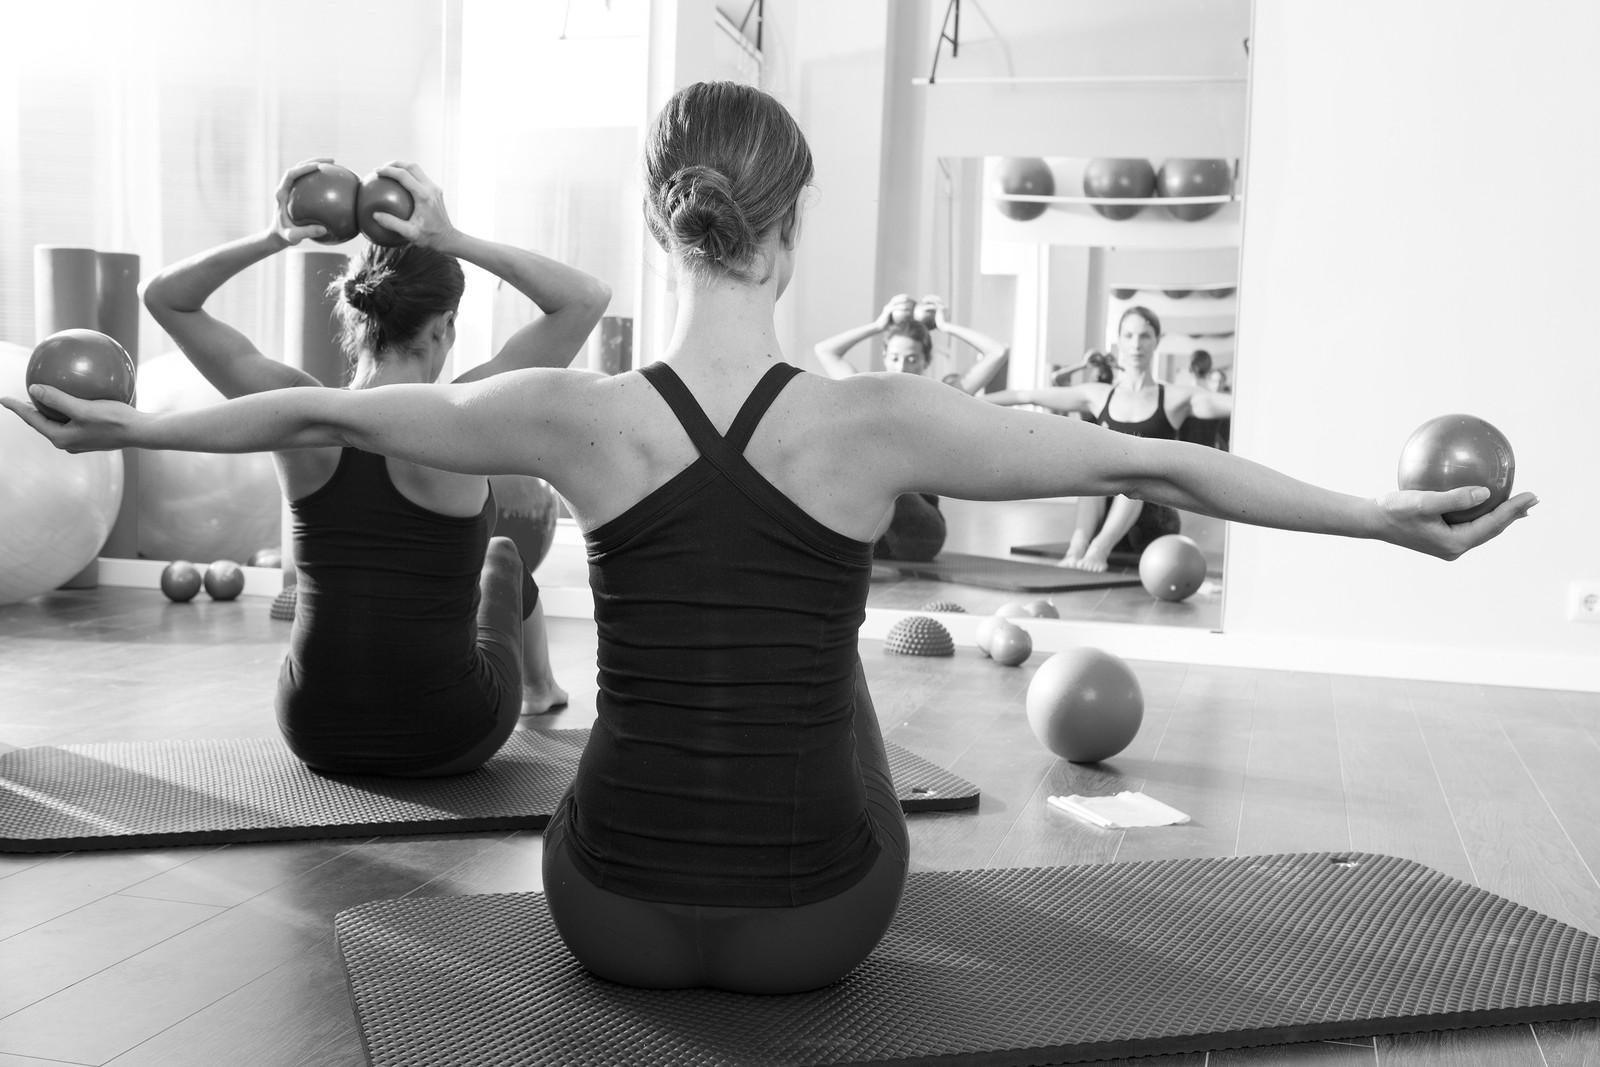 bigstock-Pilates-toning-ball-in-women-f-43125388